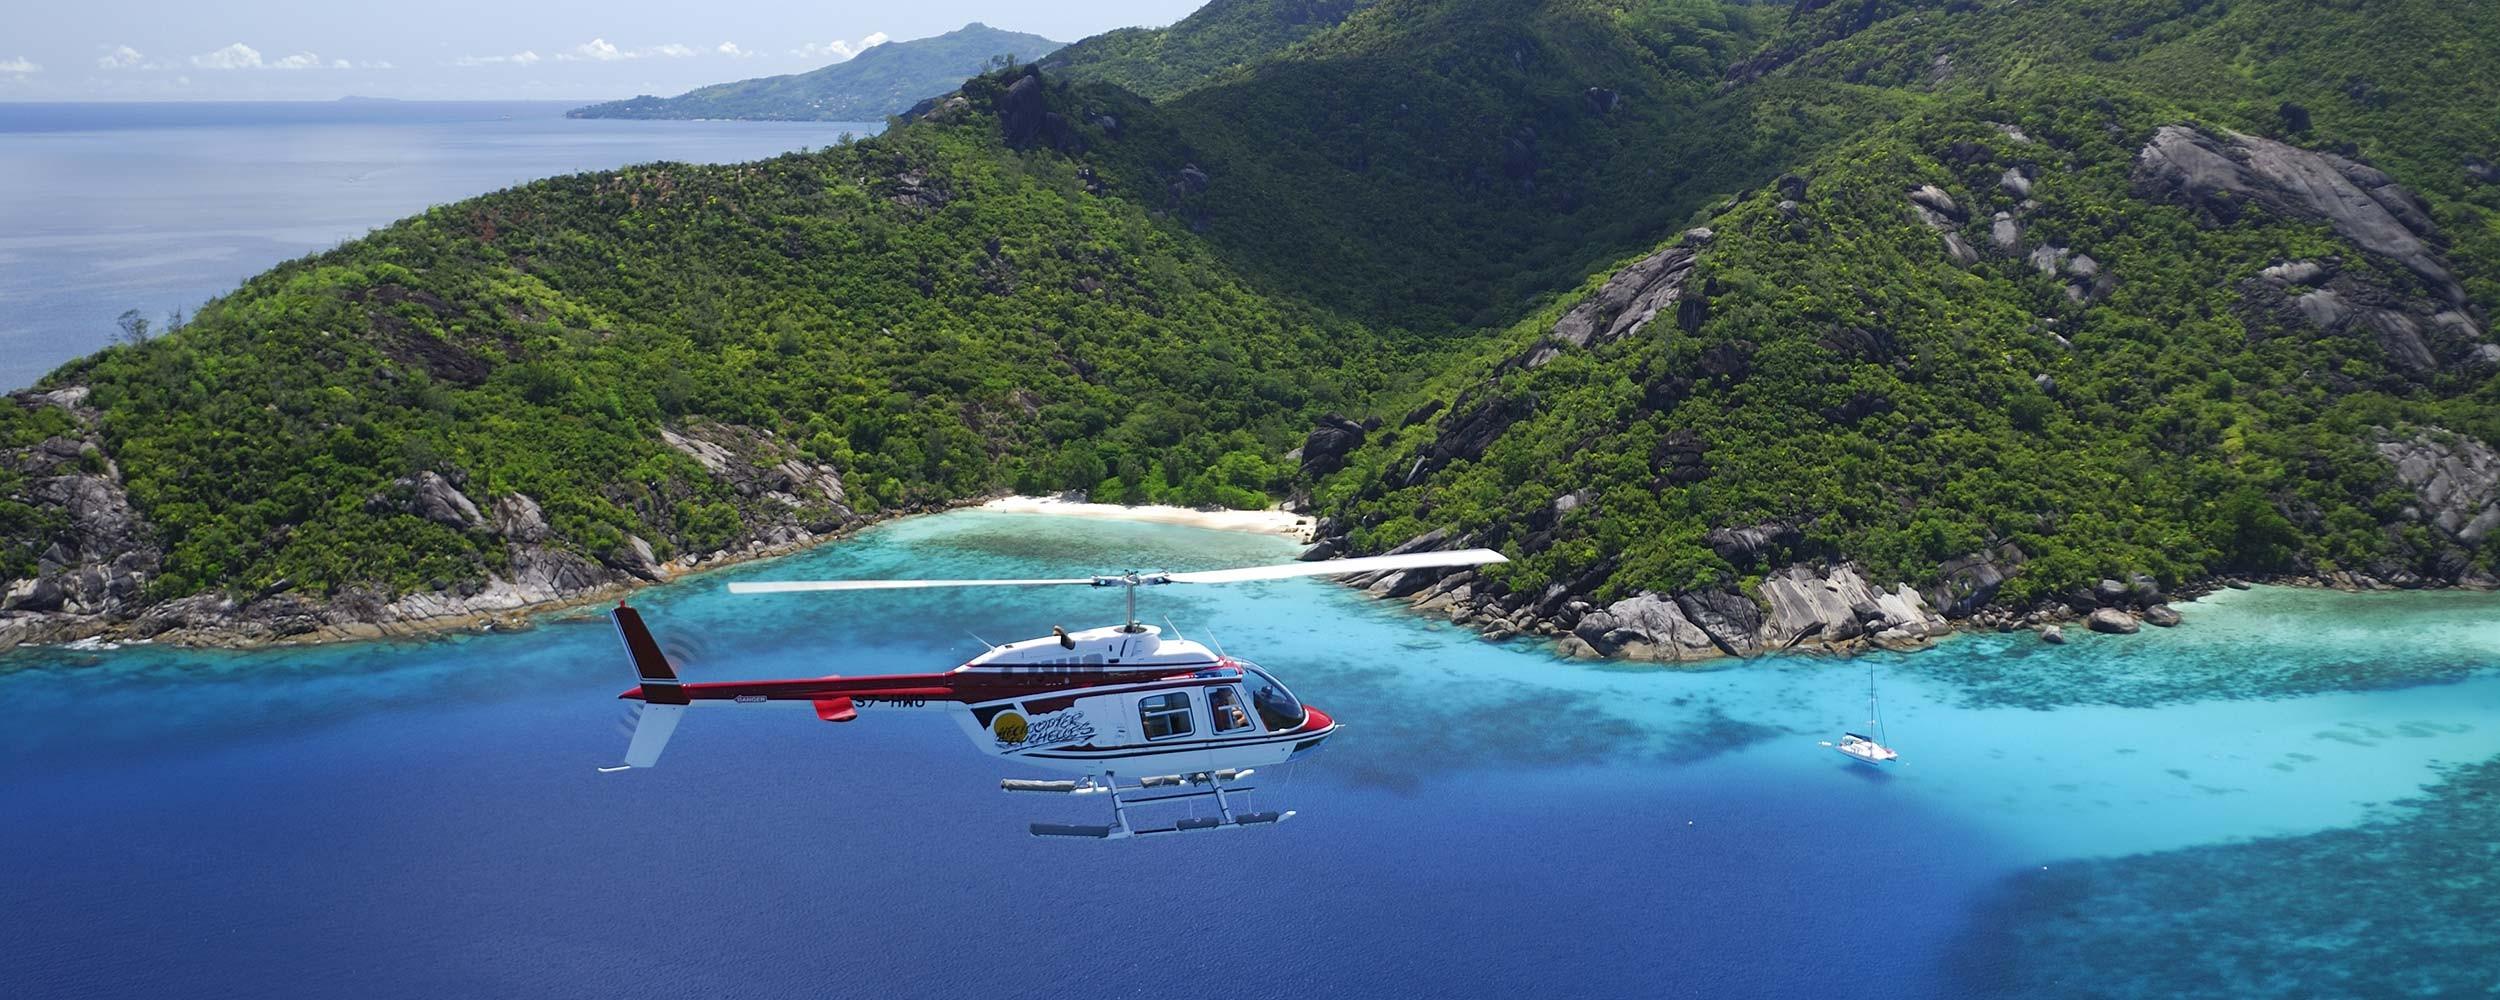 agence de voyage seychelles